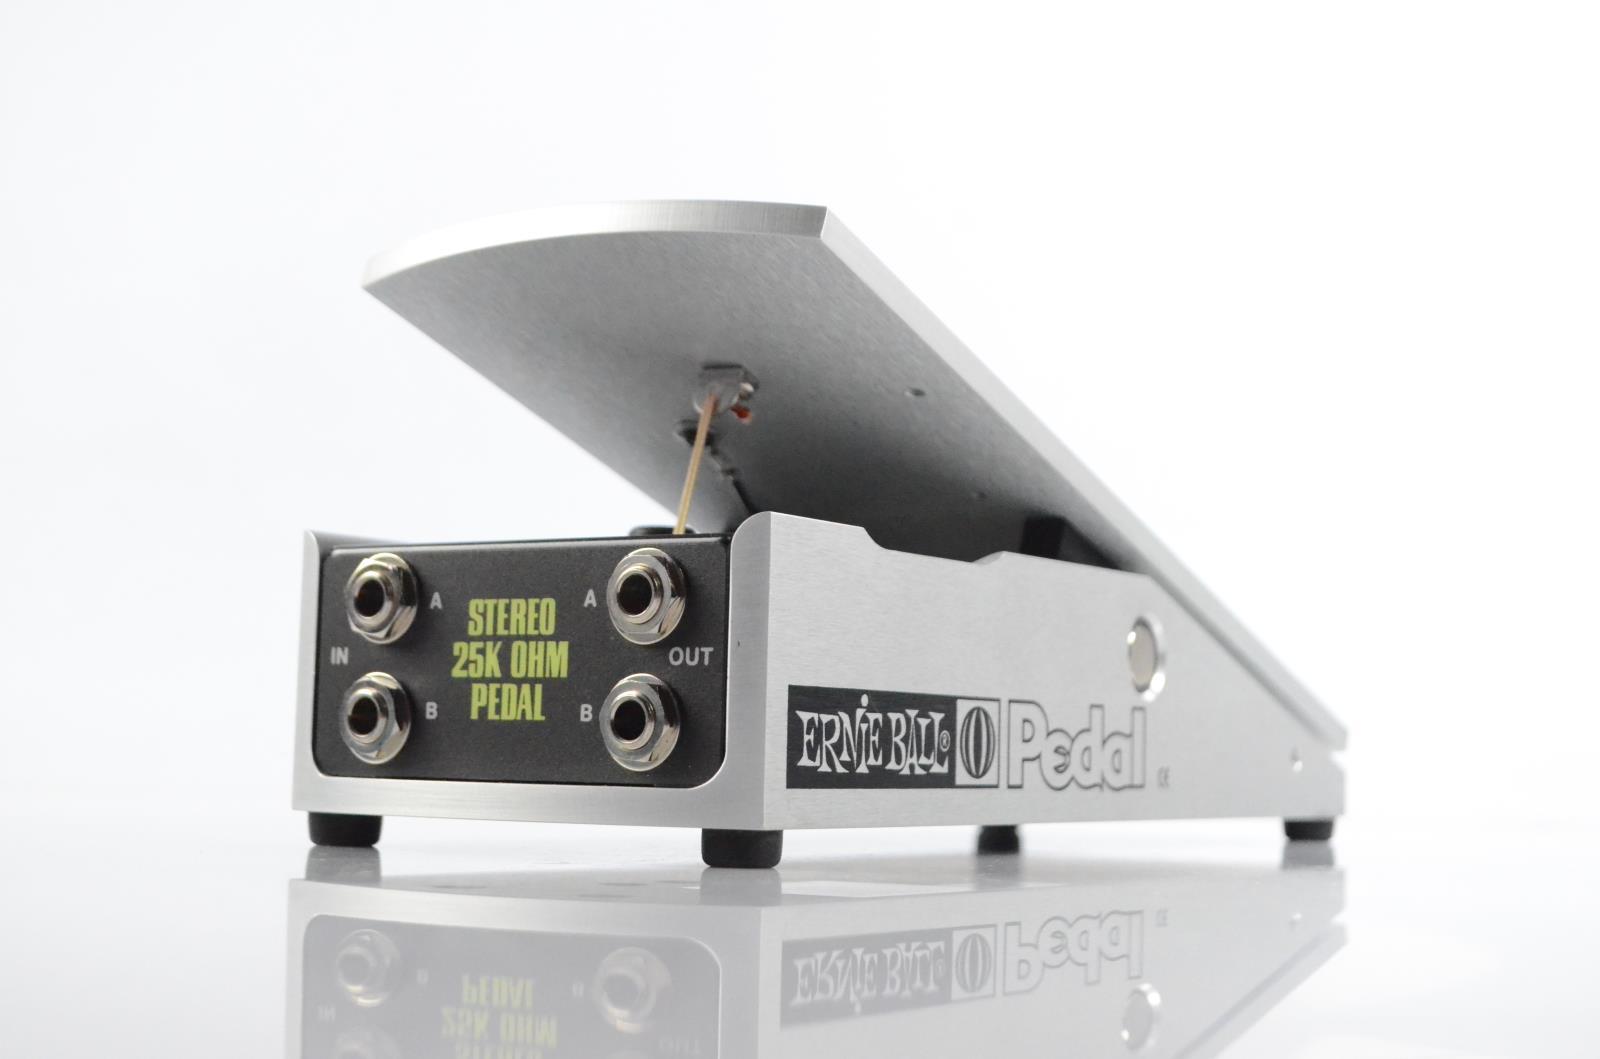 Ernie Ball 6167 Stereo 25K Ohm Pedal w/ Original Box Owned by Carlos Rios #33994